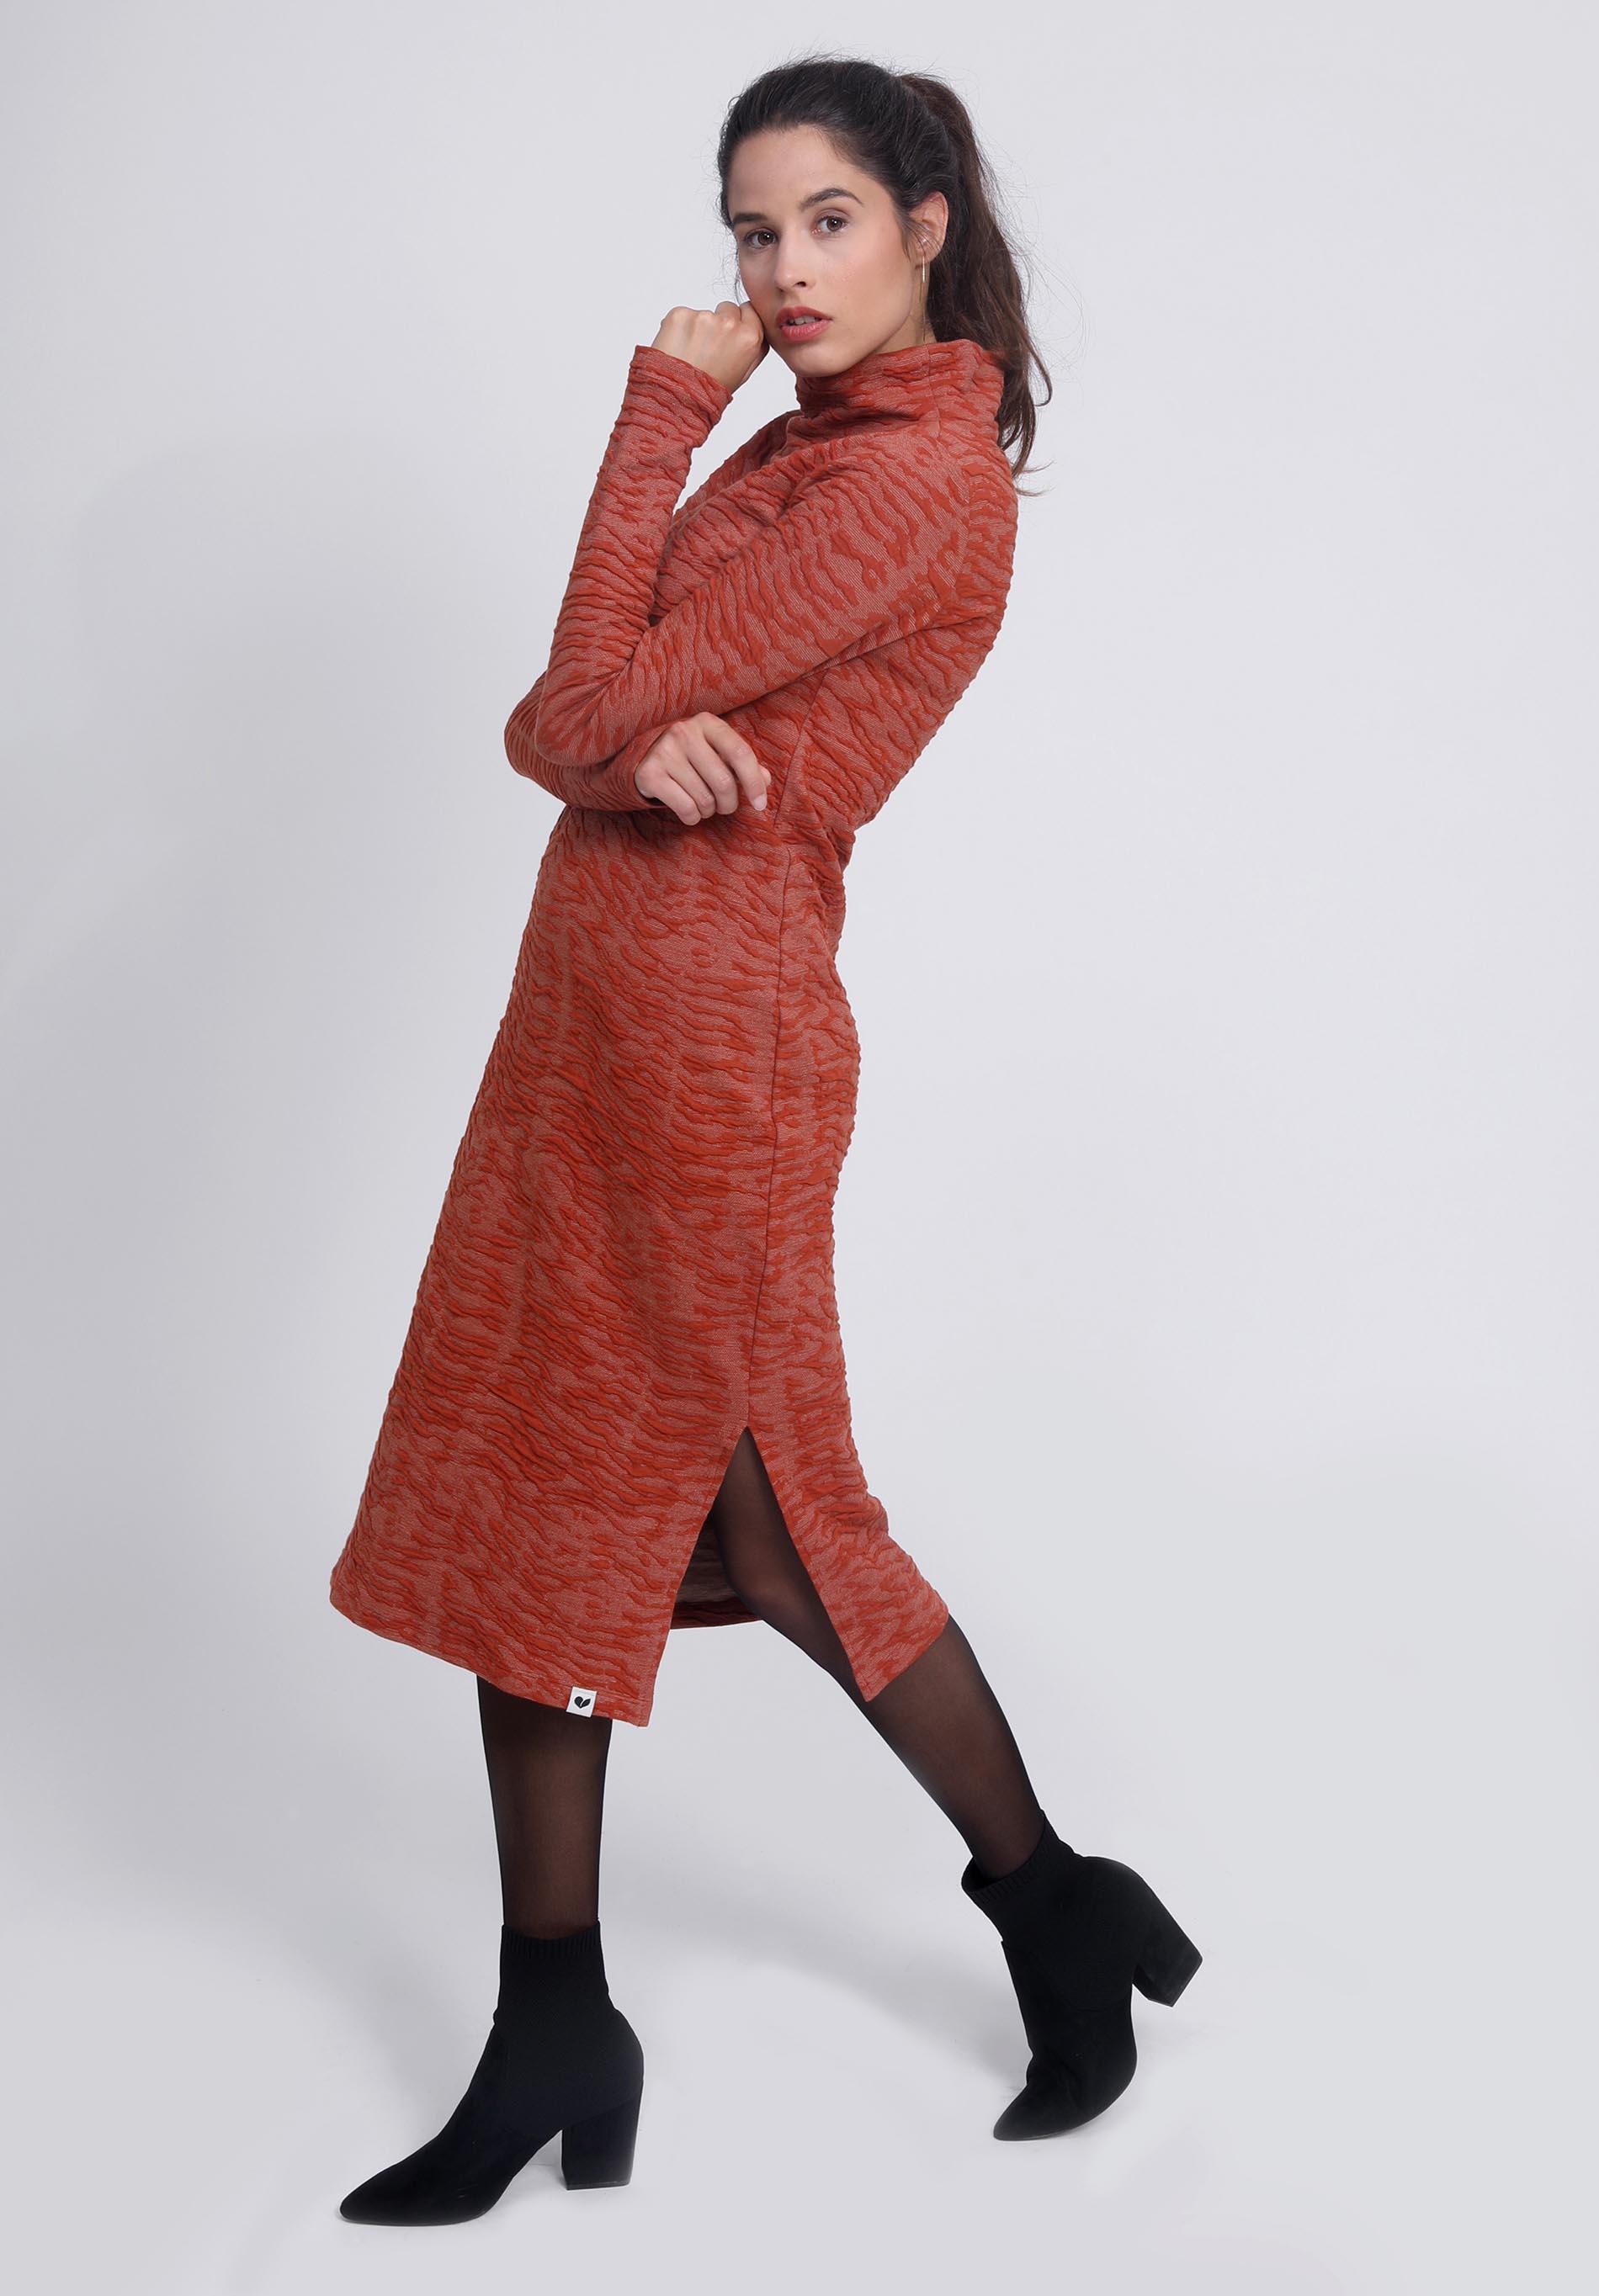 Dress SARIN chili organic cotton Relief